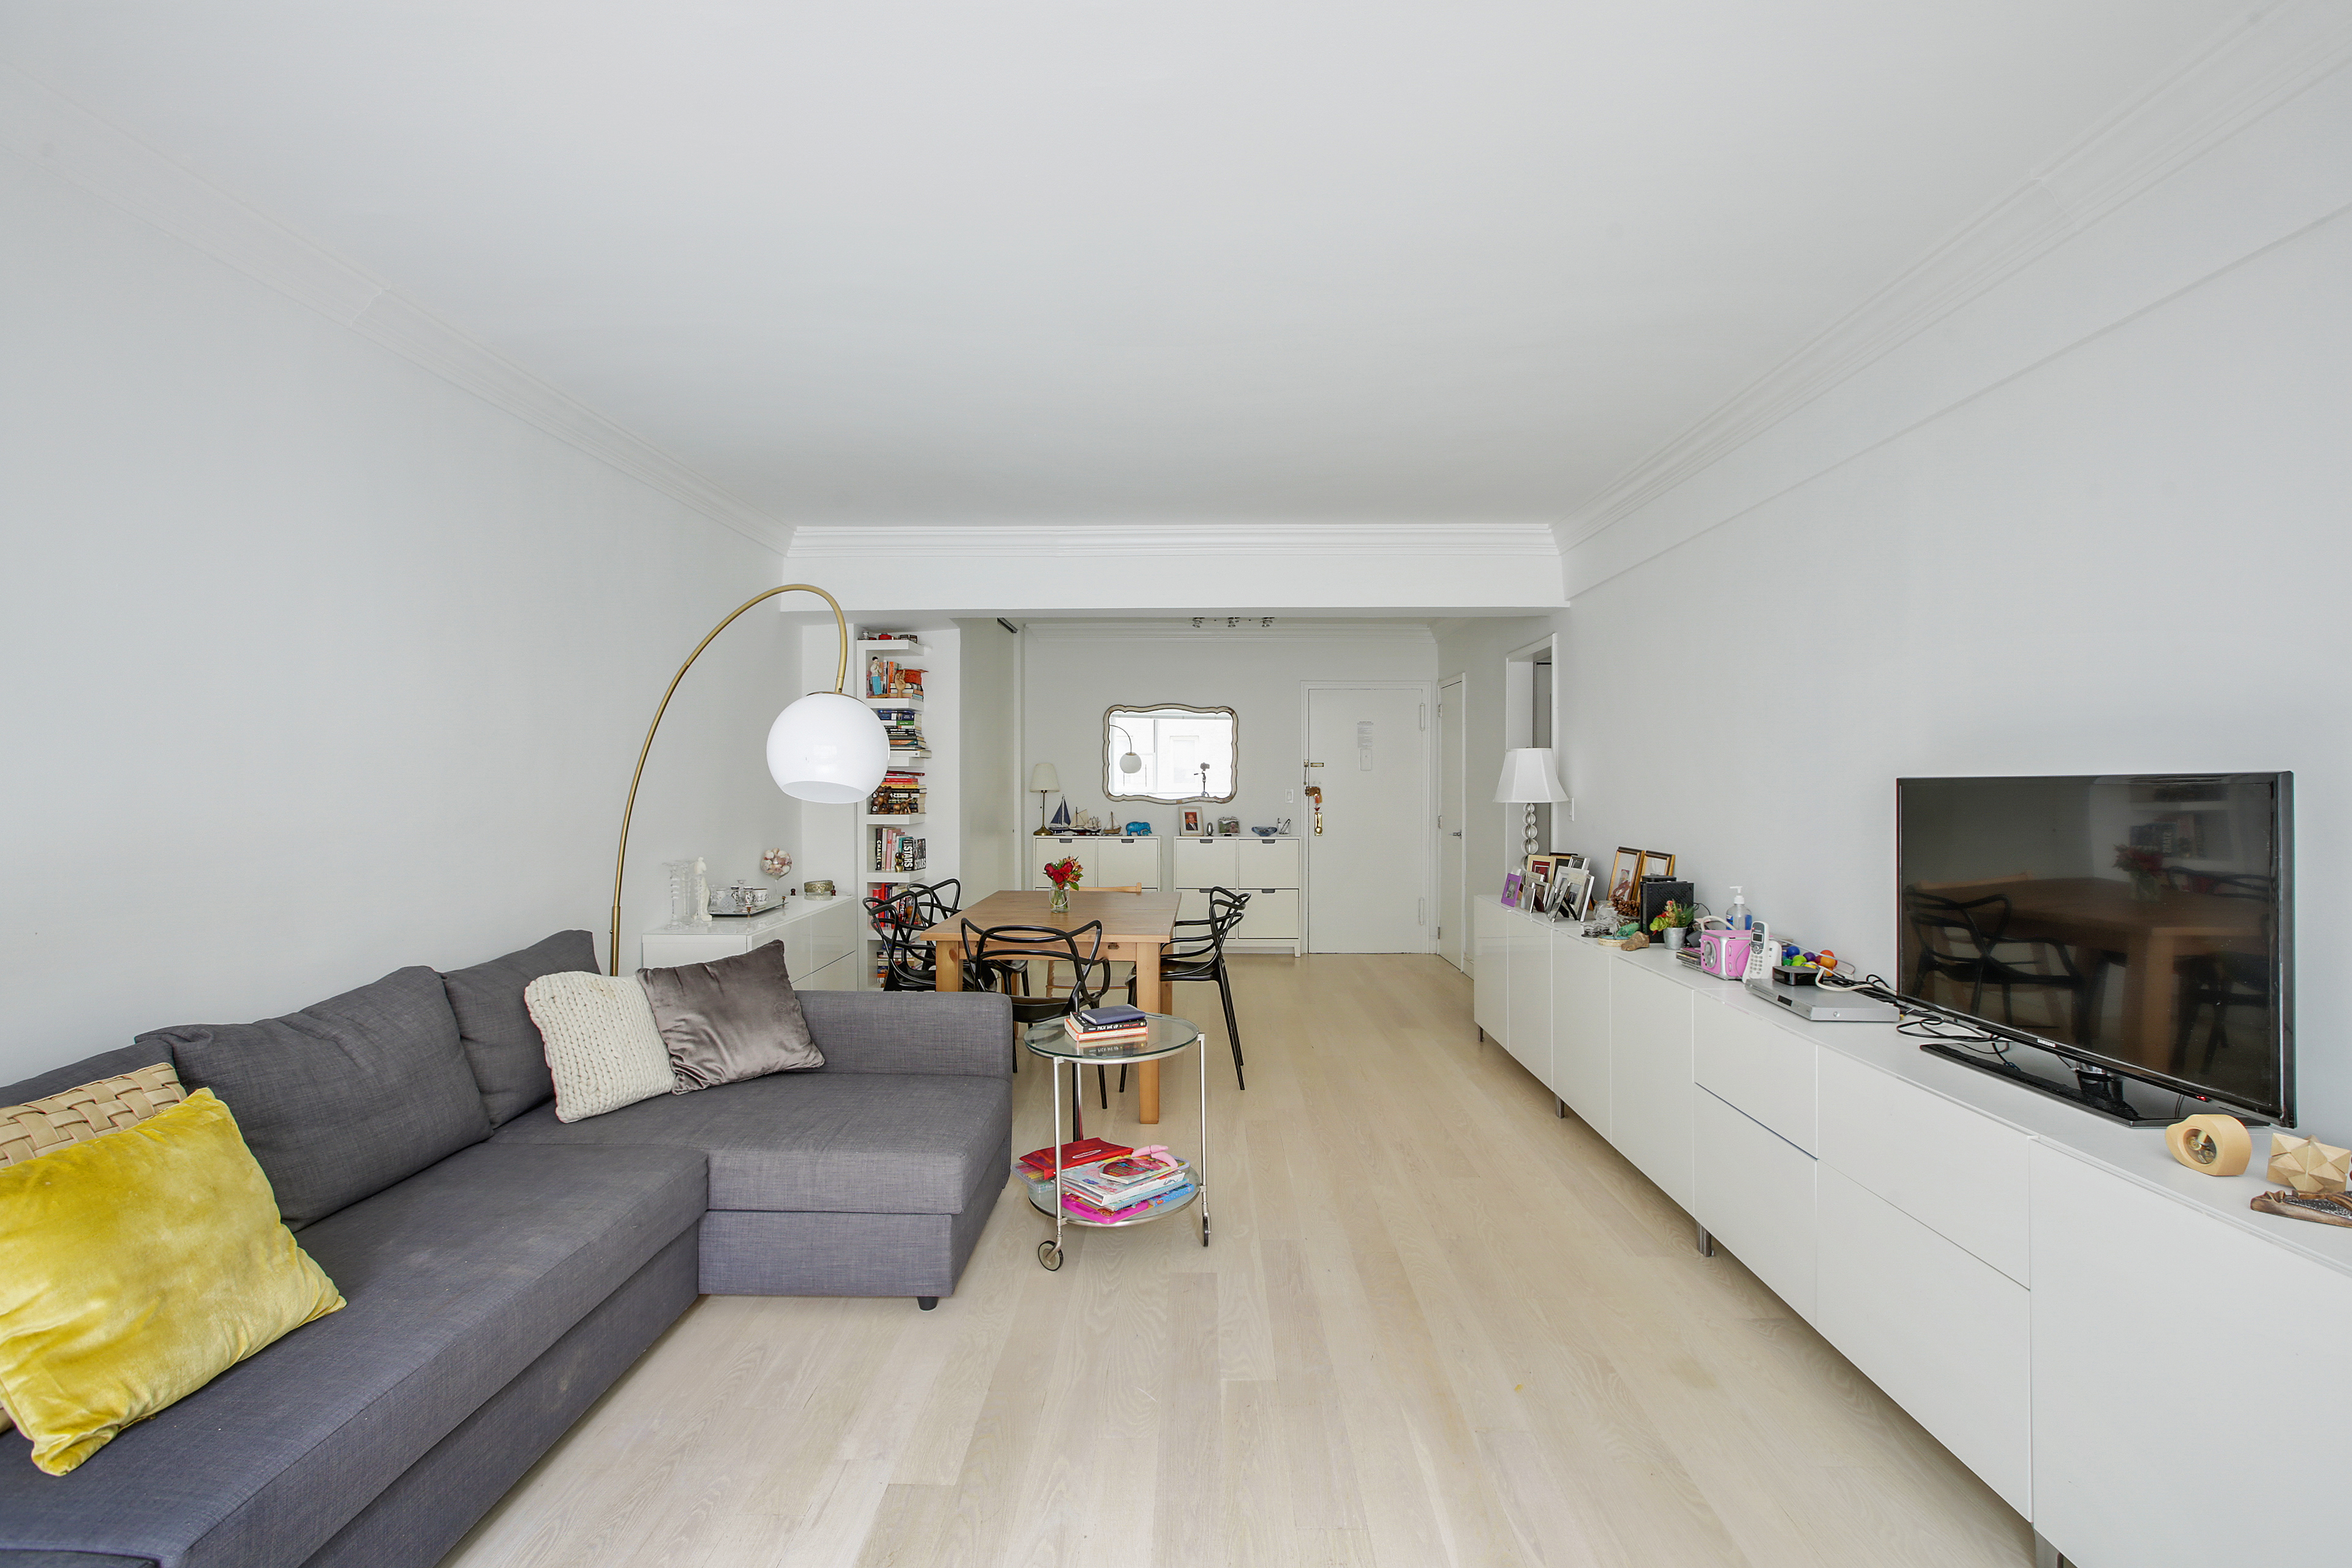 C. Living Room